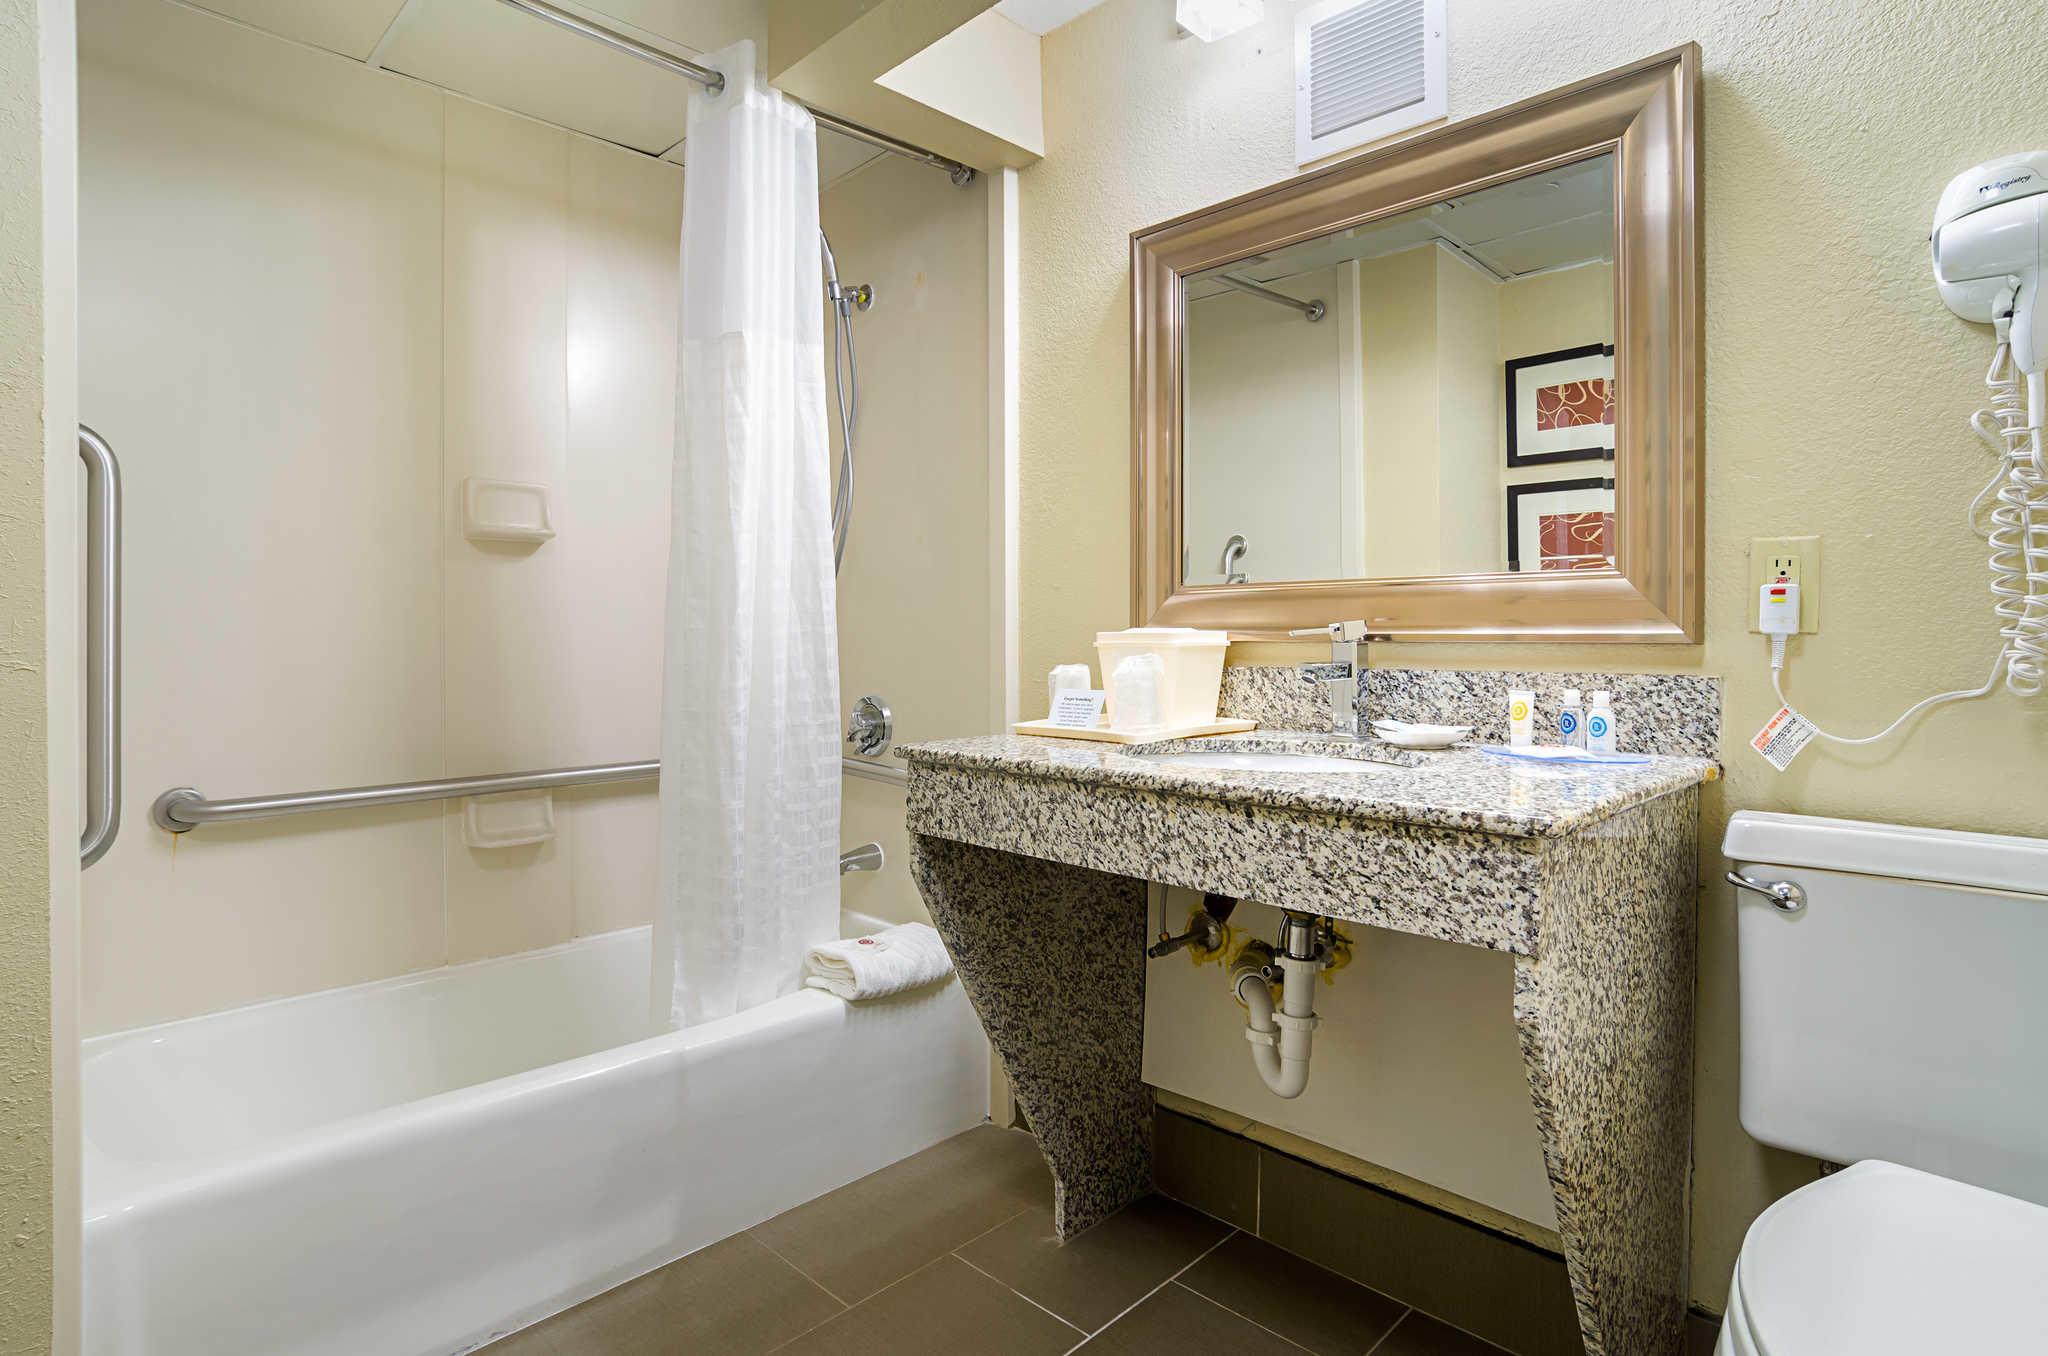 Comfort Inn & Suites Duke University-Downtown image 17